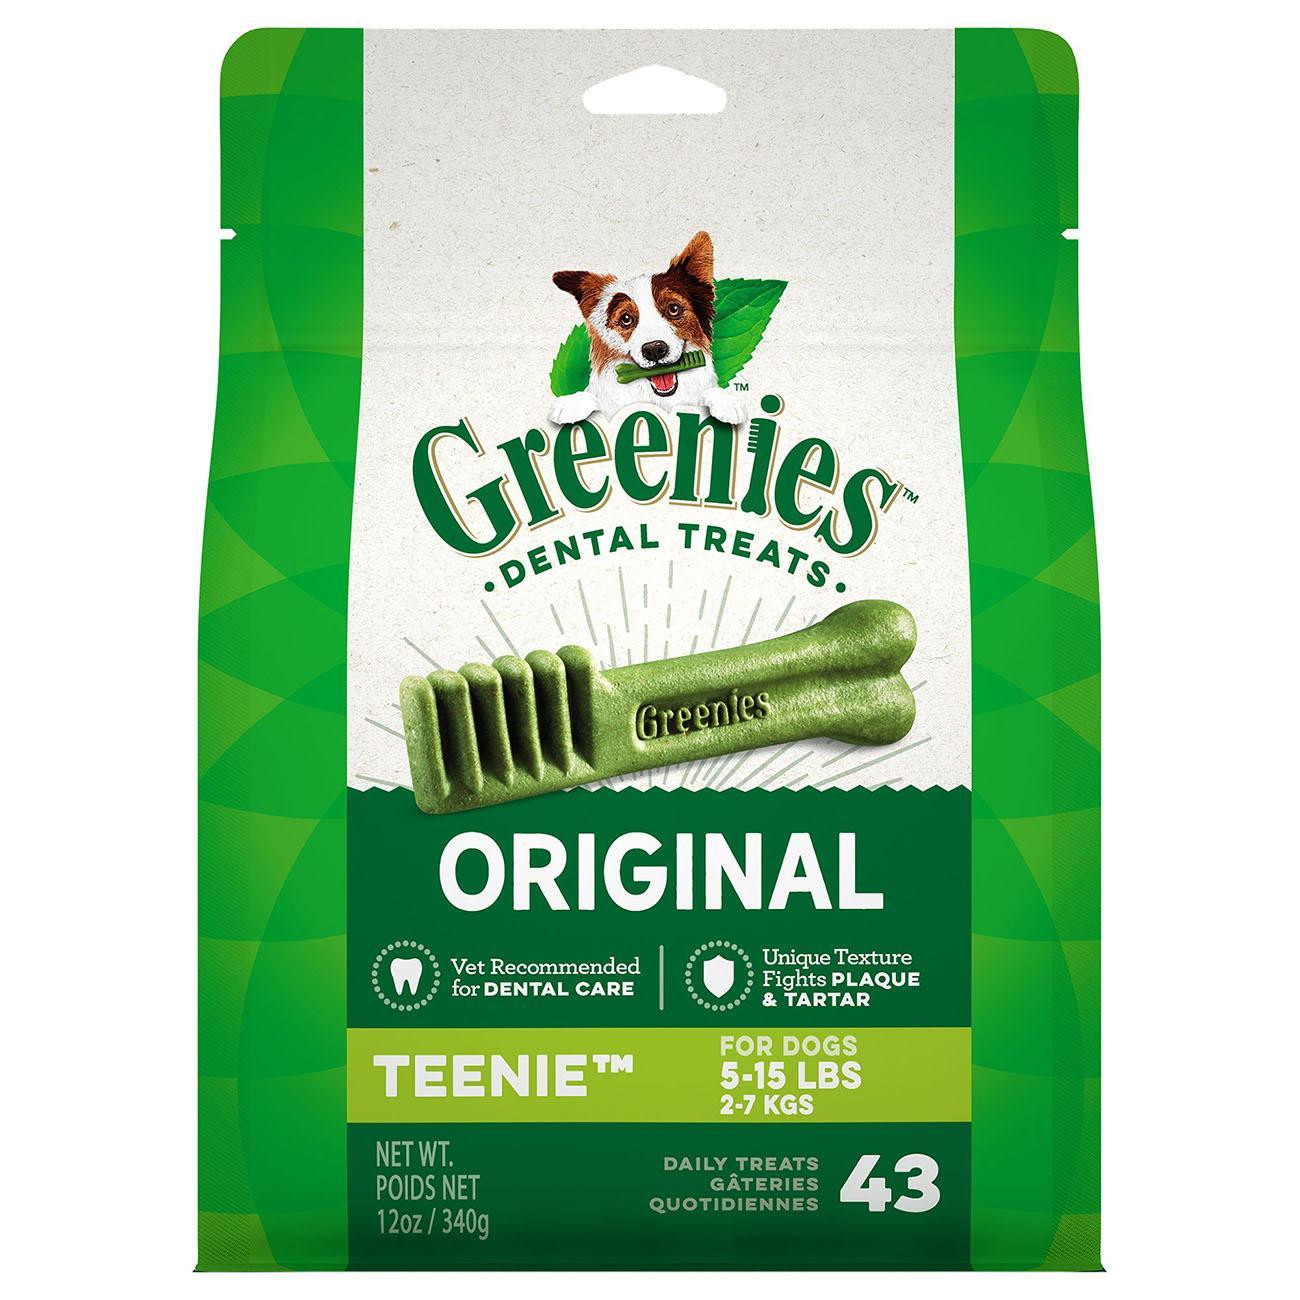 Greenies Original Dental Dog Chews - Teenie Dog Size